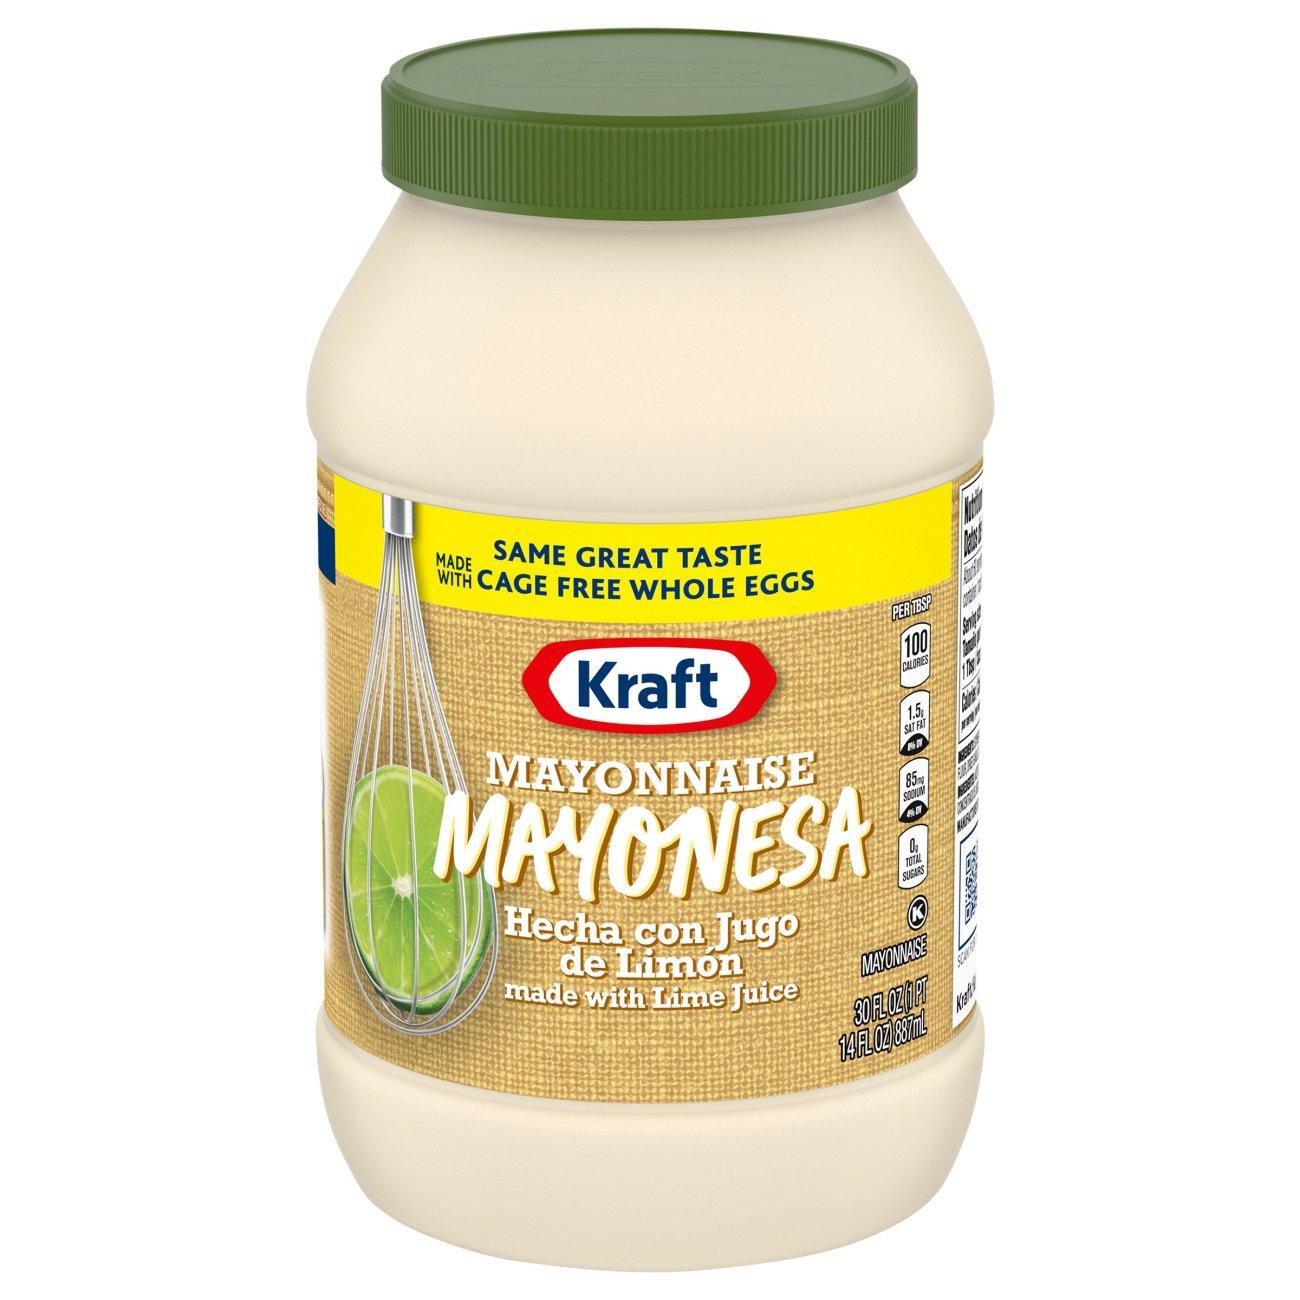 Kraft Mayonesa Real Mayonnaise With Lime Juice Shop Mayonnaise Spreads At H E B